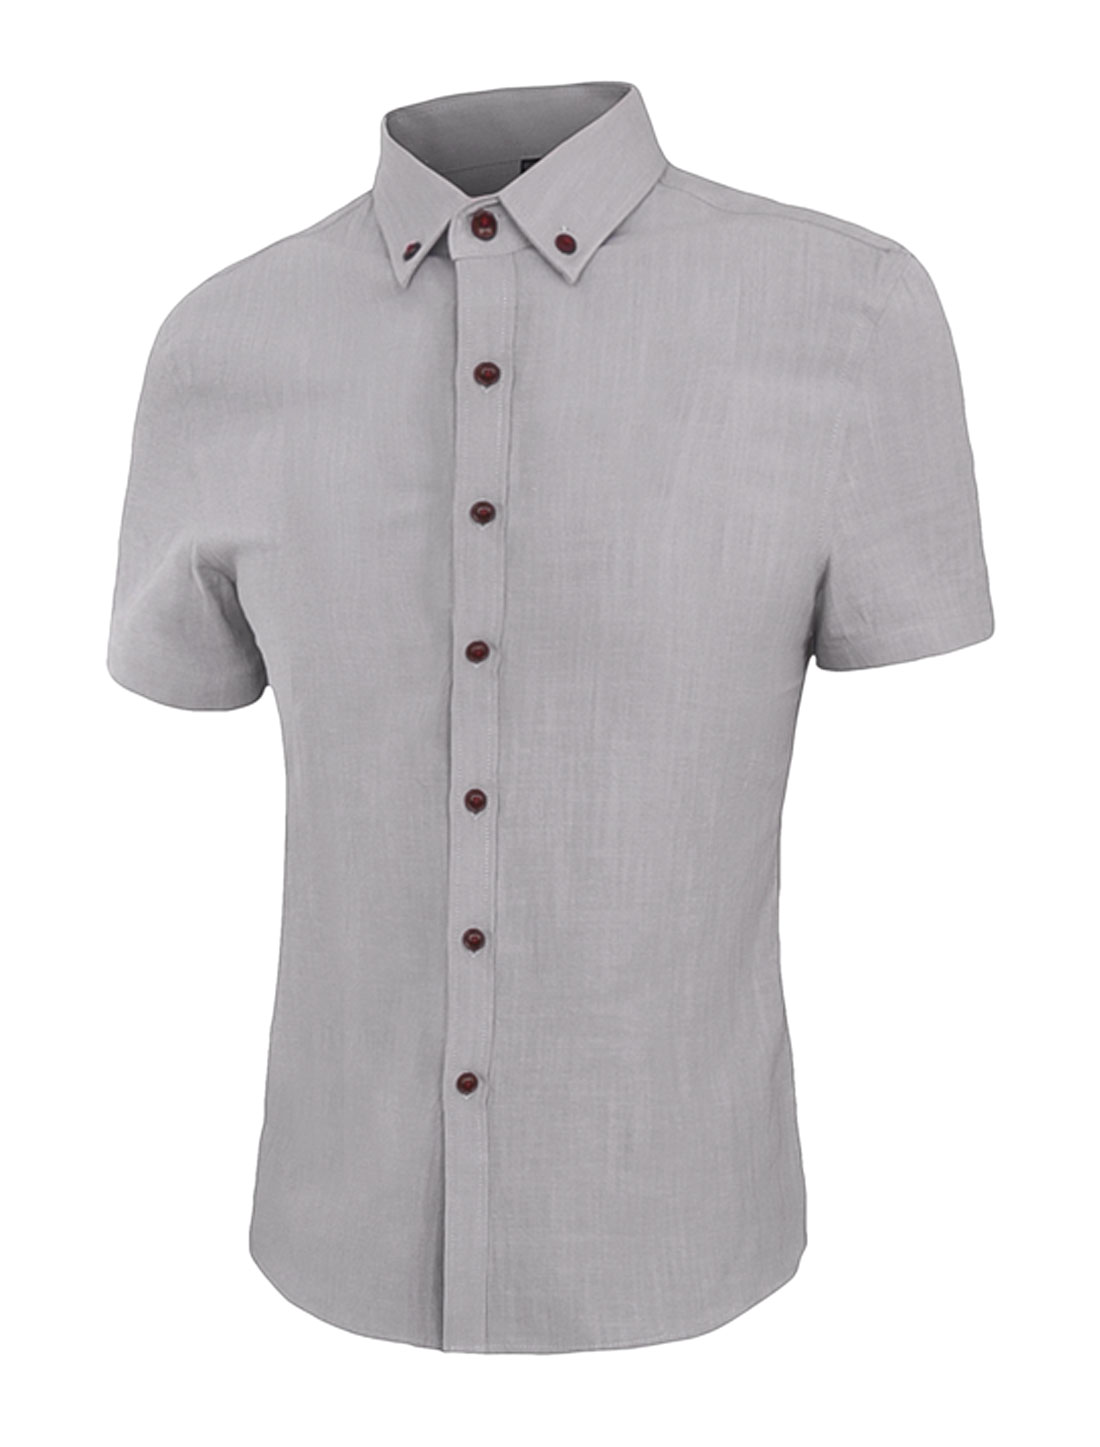 Men Point Collar Short Sleeves Slim Fit Button Down Shirt Gray S